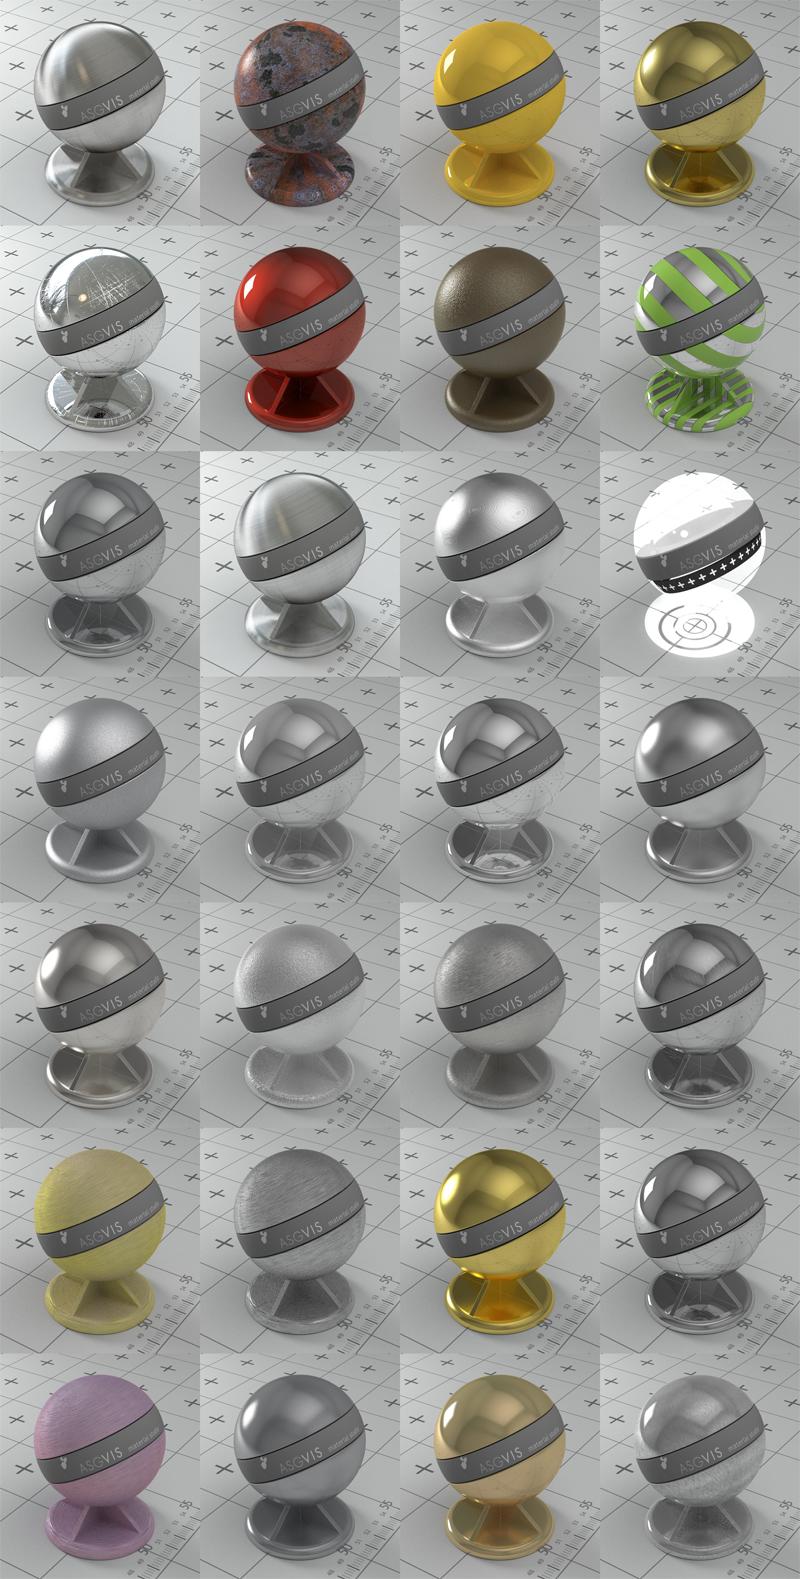 1115 materiales colecci n vismat para sketchup gratis for Azulejos para sketchup 8